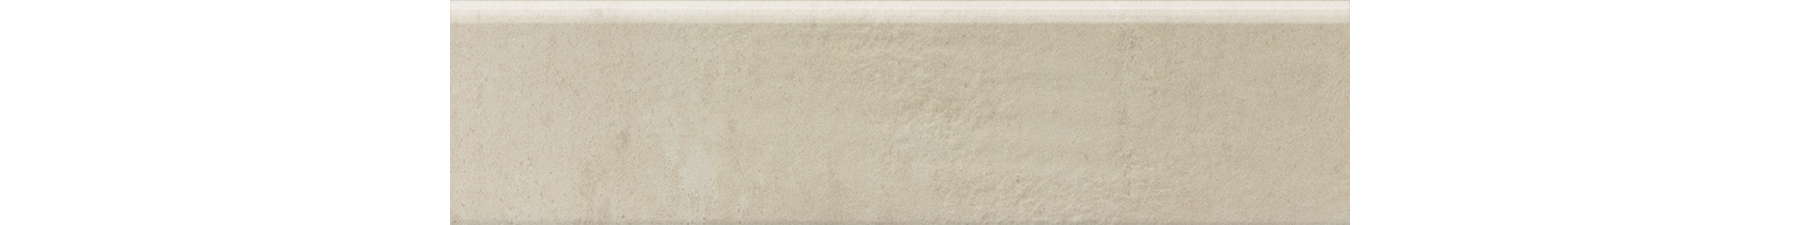 District Blanco 3x12 Porcelain Bullnose Floor Tile